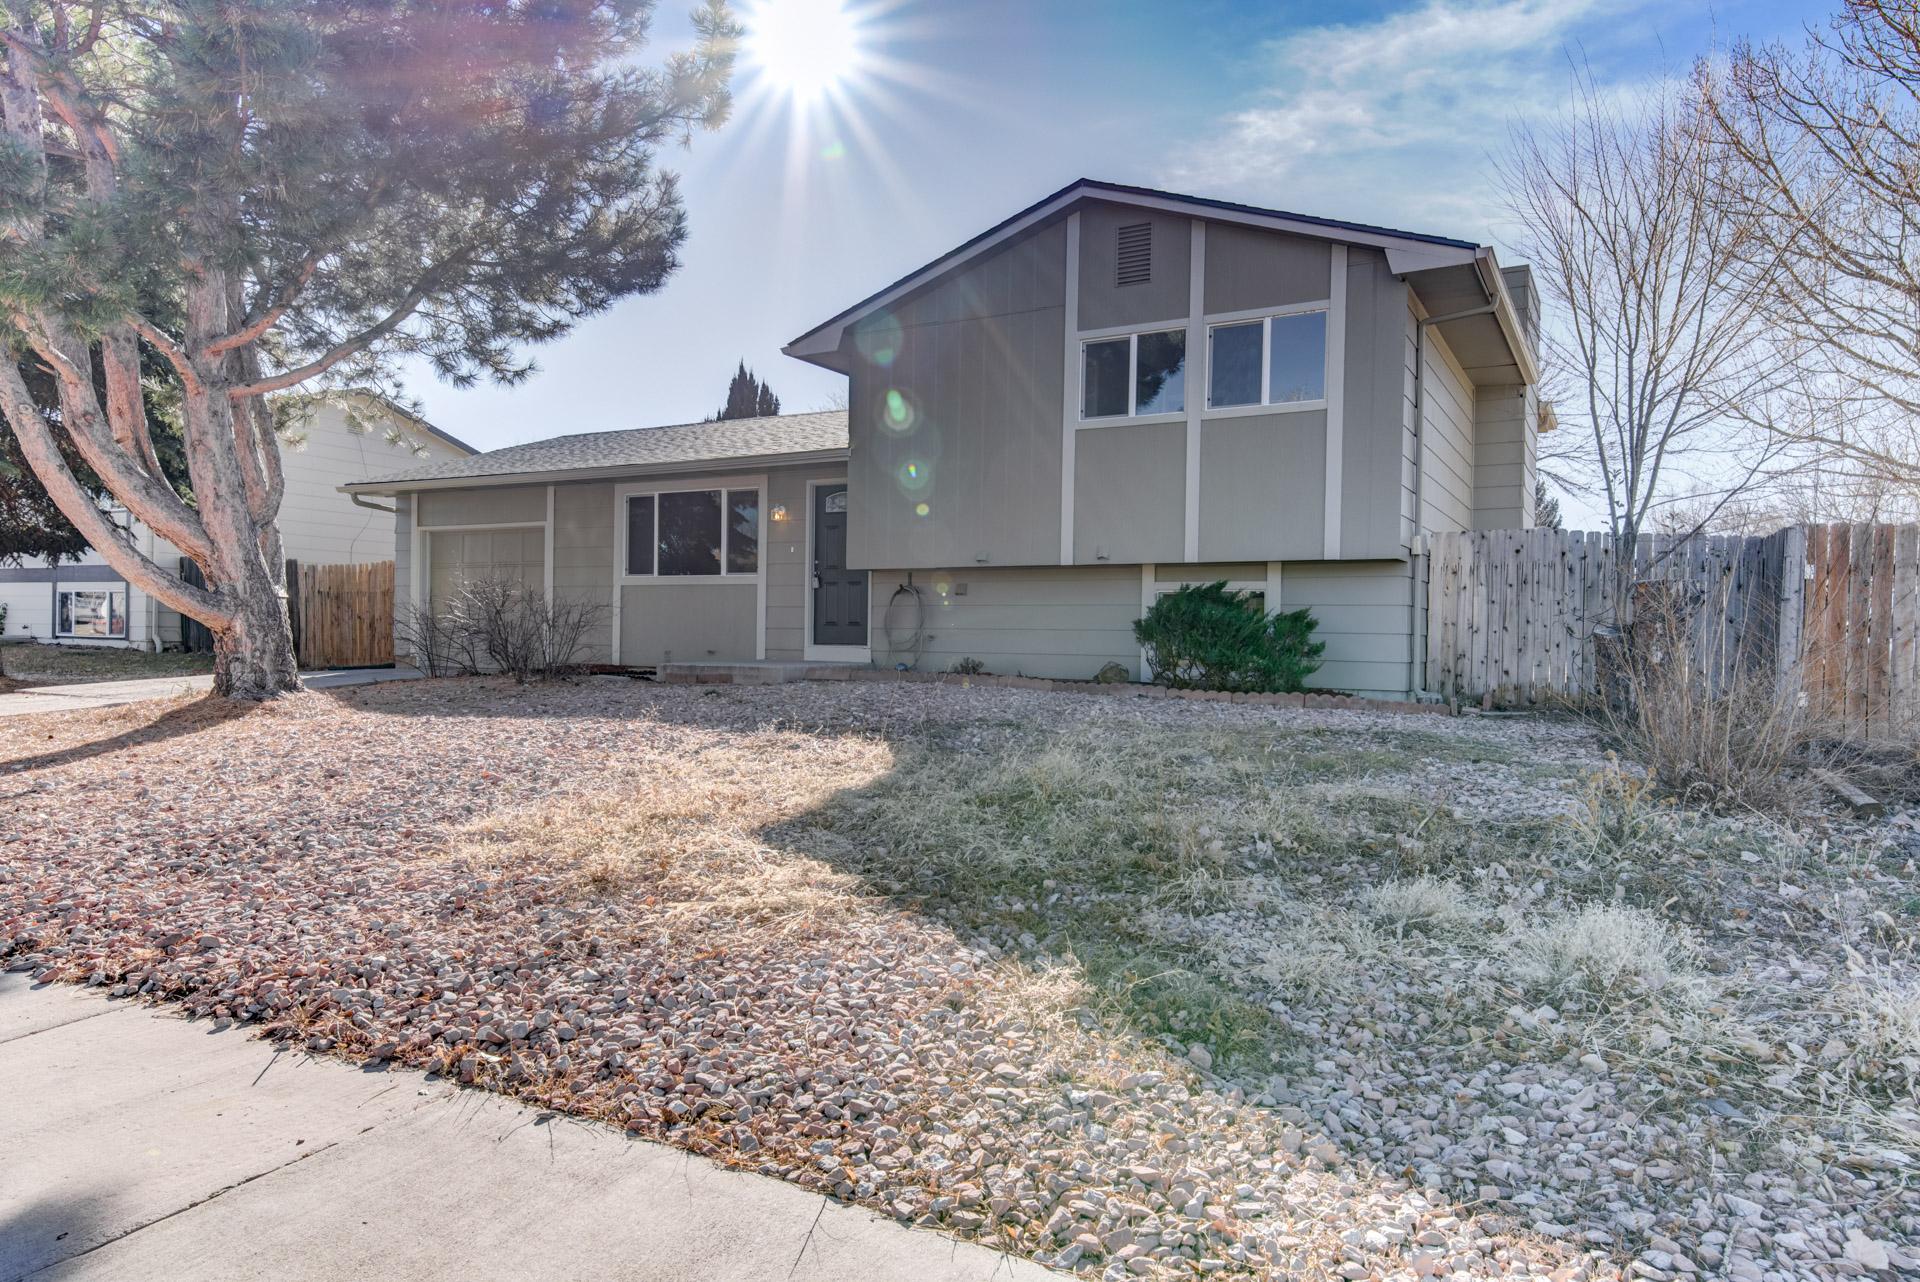 6780 Goldfield Dr, Colorado Springs, CO 80911